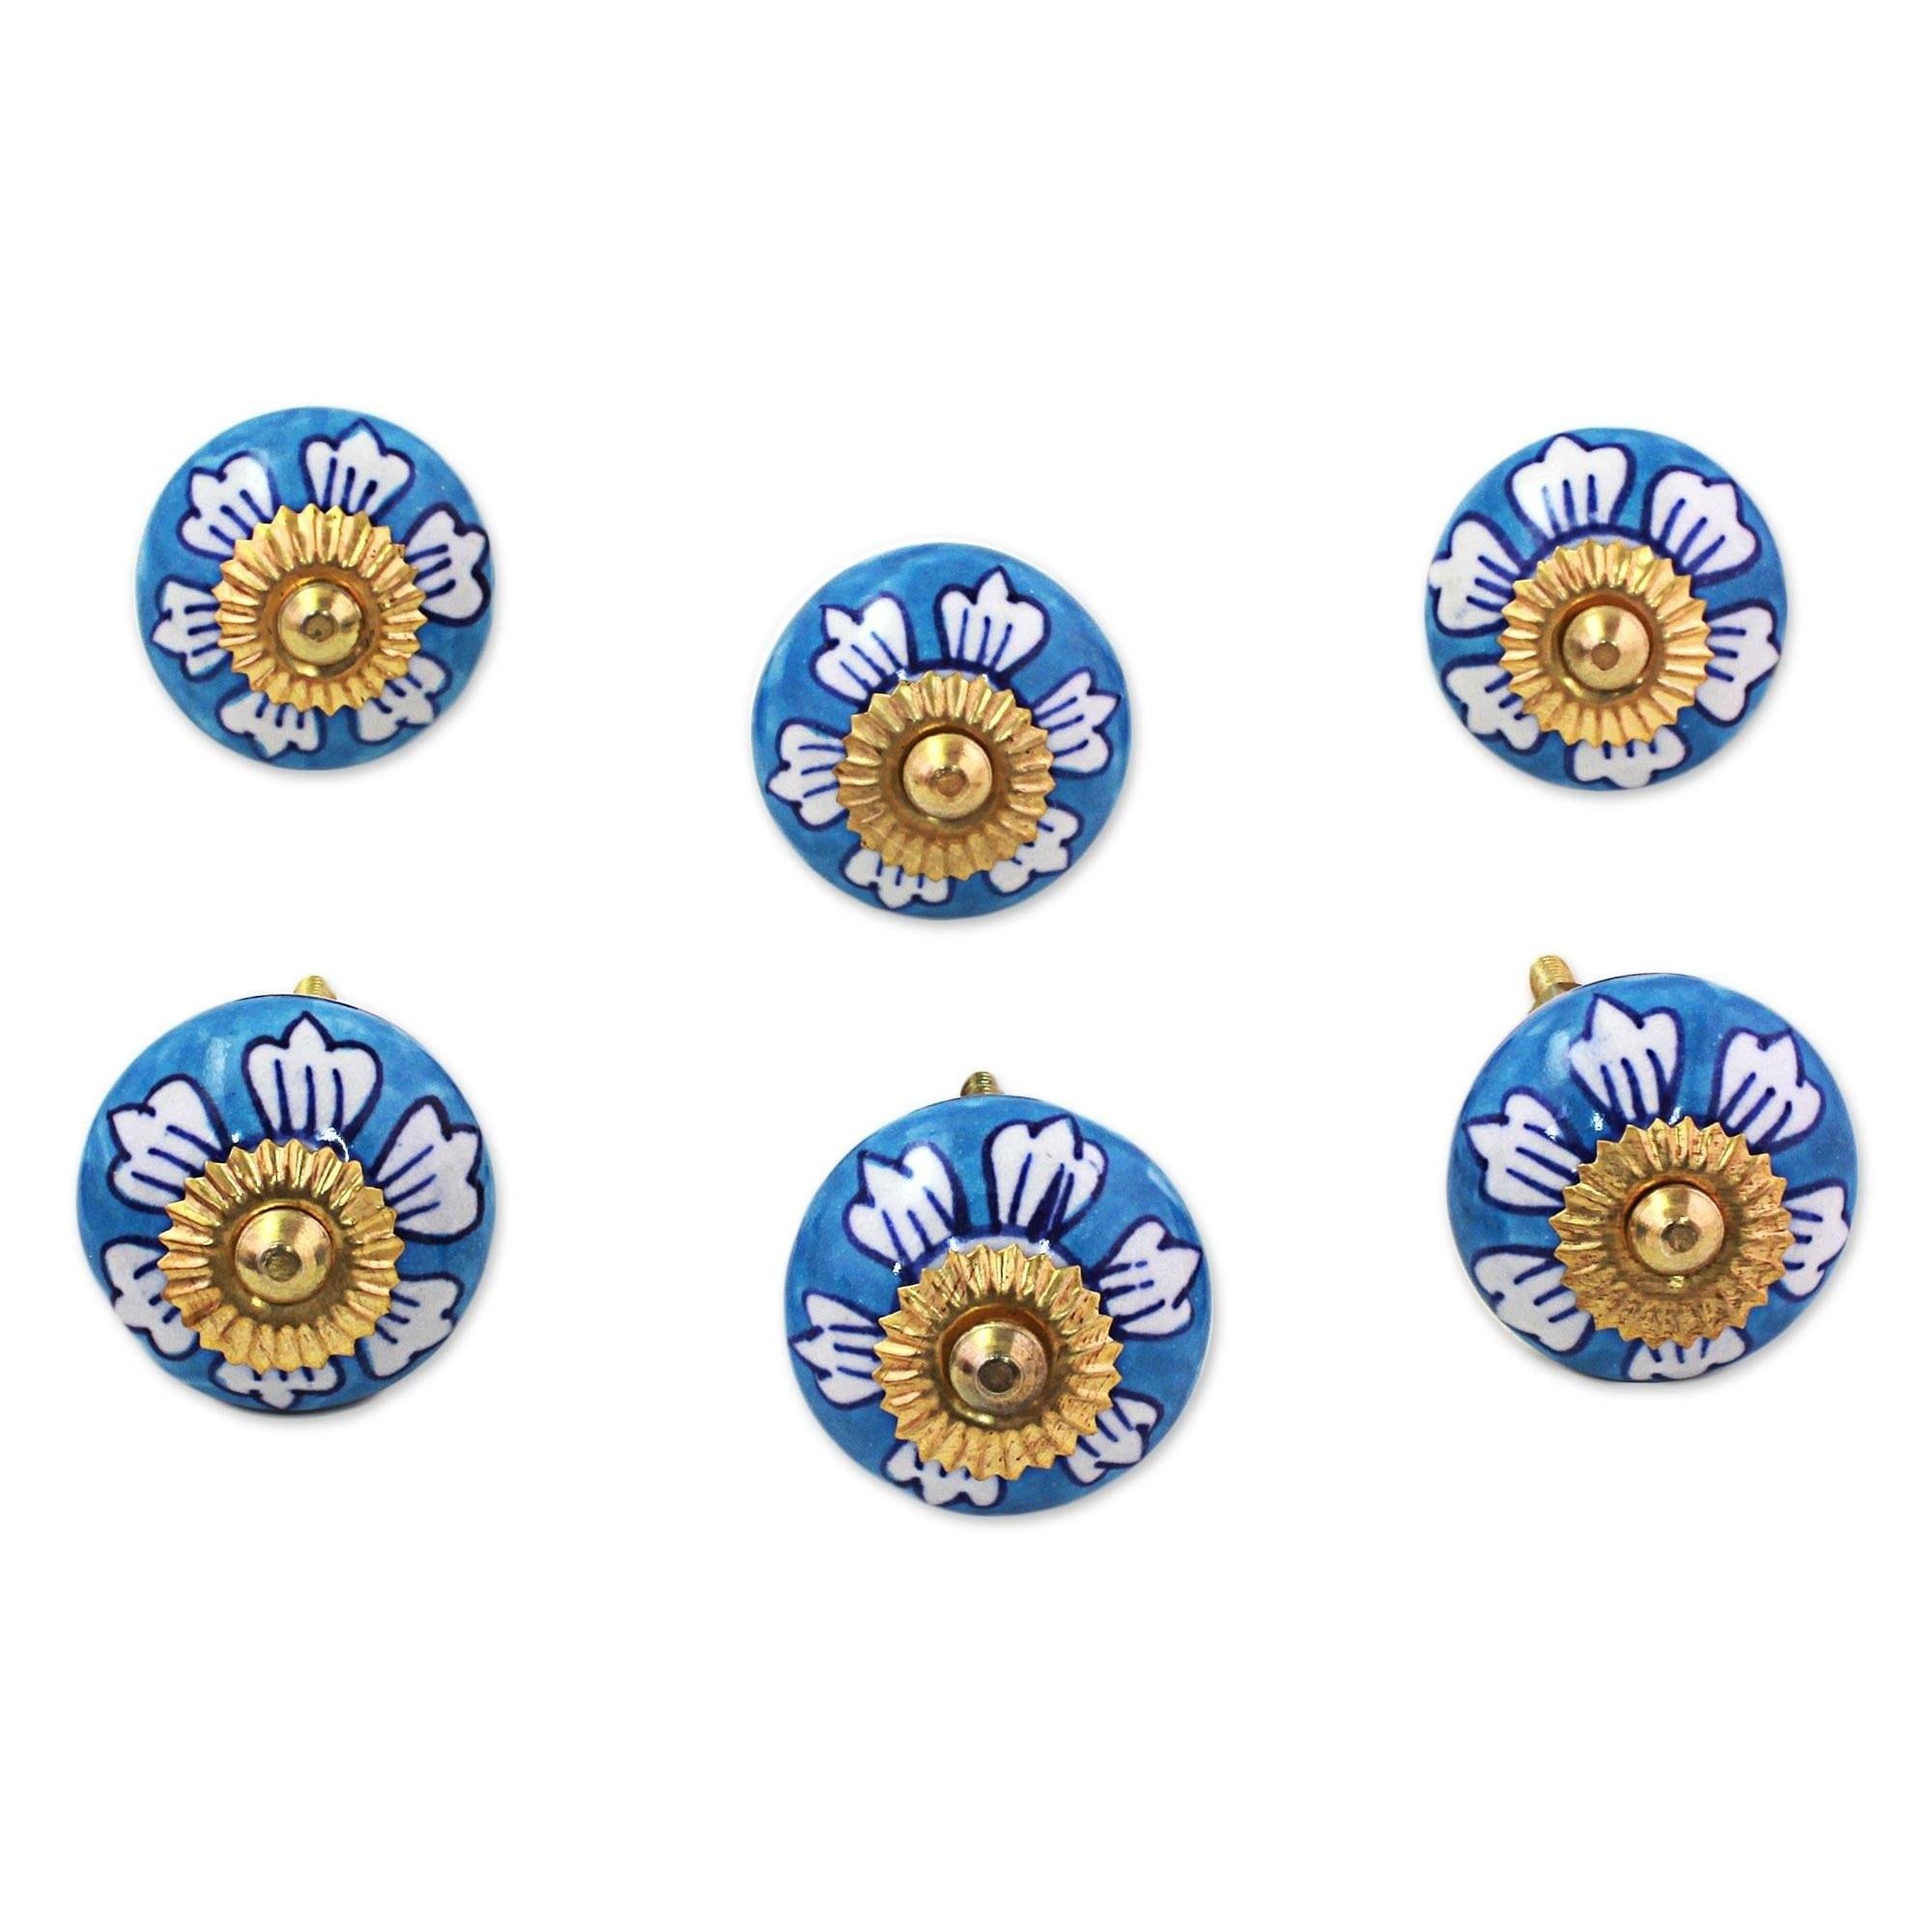 25 GLASPERLEN Rund 7-8mm peridot B-WARE Silberfolie nenad-design Perlen AN248